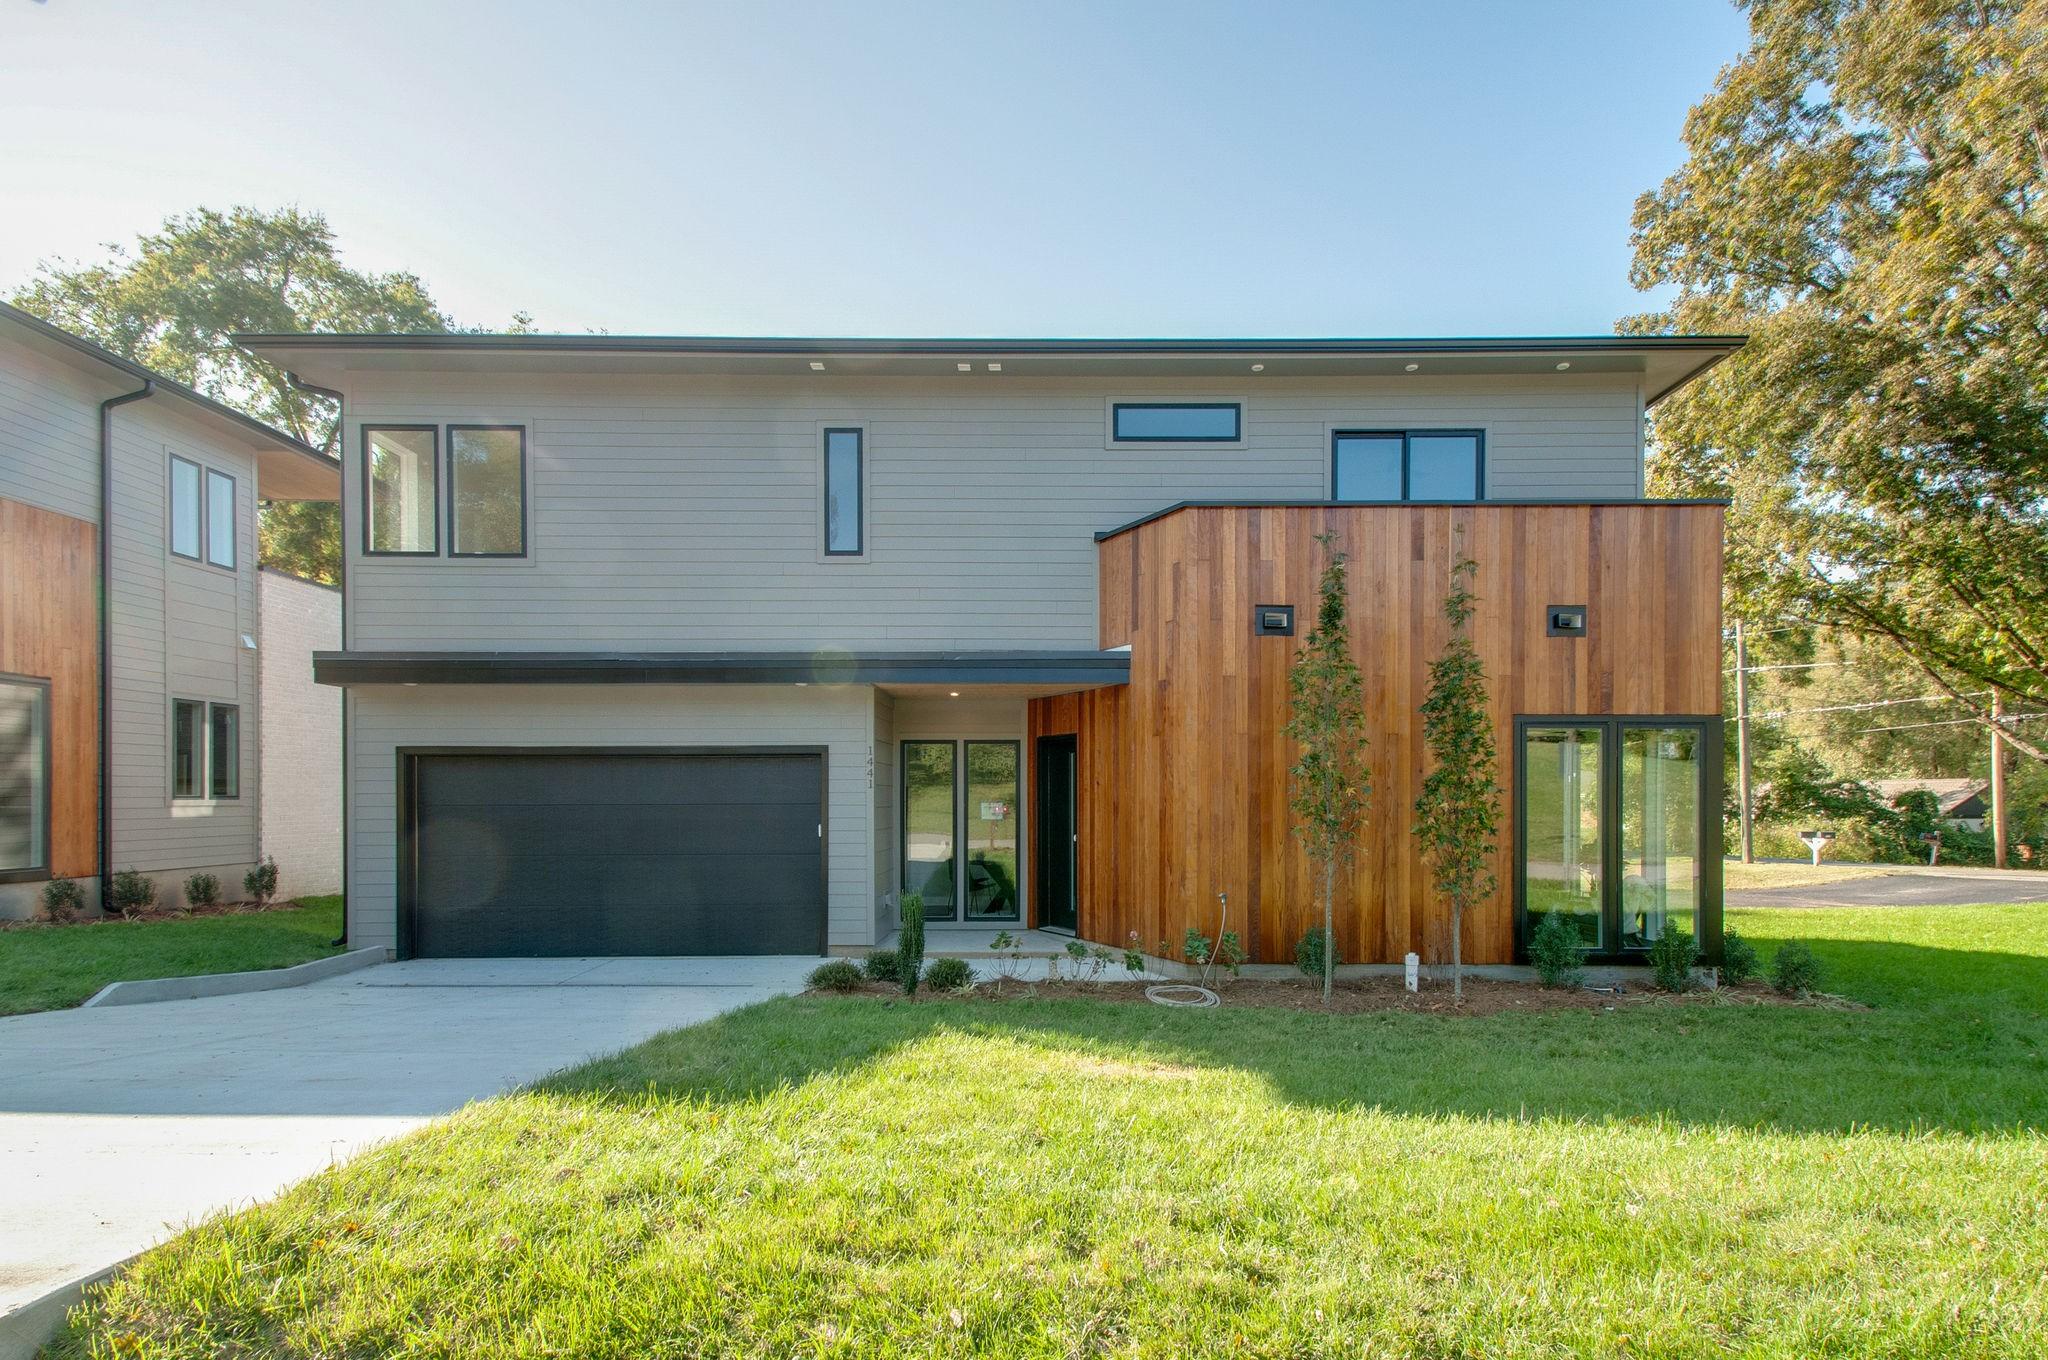 1441 Huffine St, Nashville, TN 37216 - Nashville, TN real estate listing